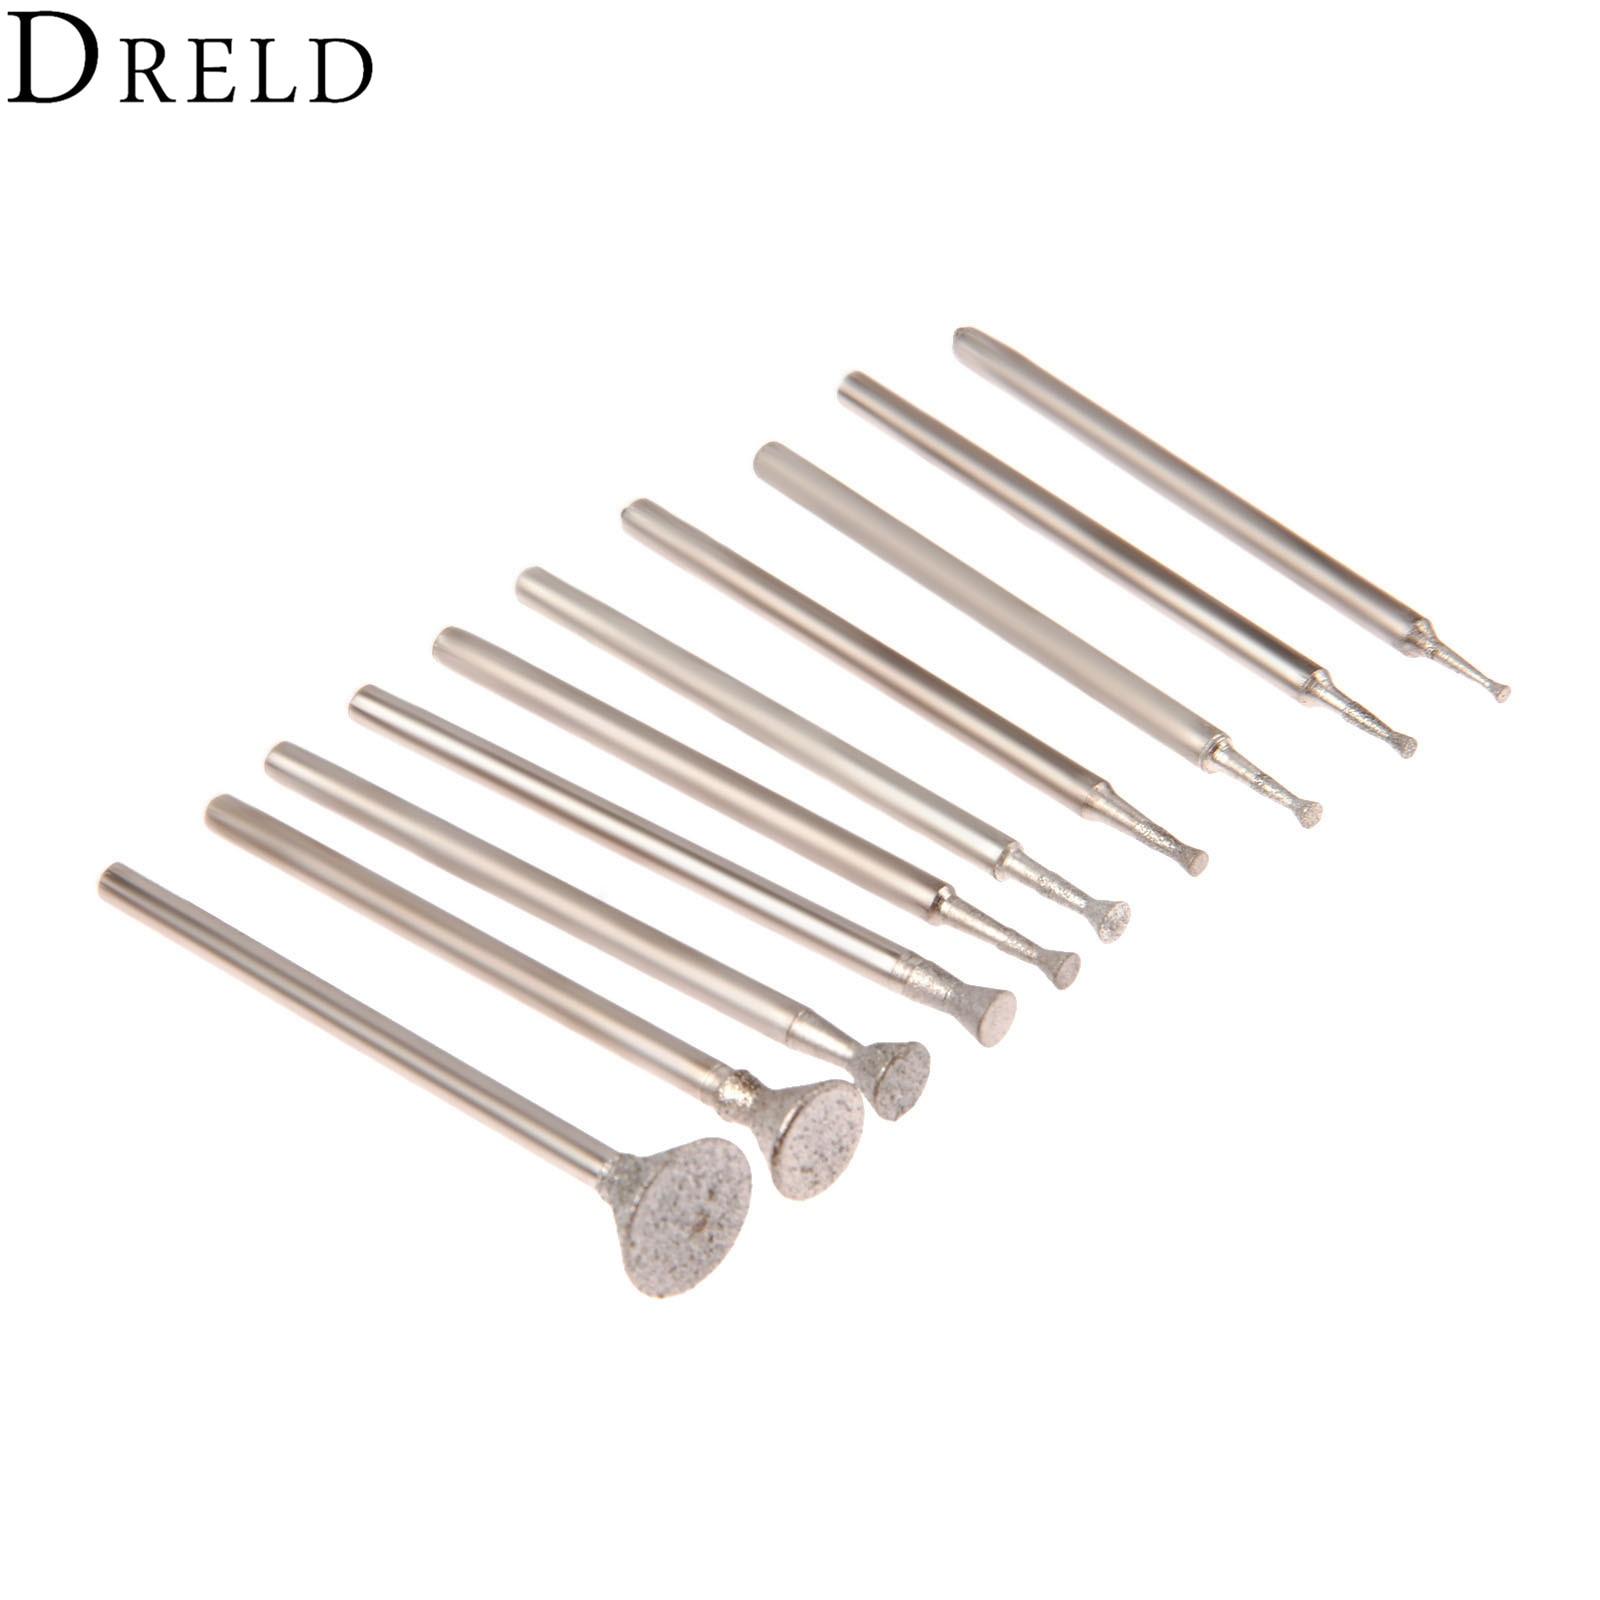 DRELD 10Pcs Dremel Accesories Drill Diamond Grinding Head Burrs Bits 2.35mm Shank Jade Stone Engraving Carving Polishing Tool